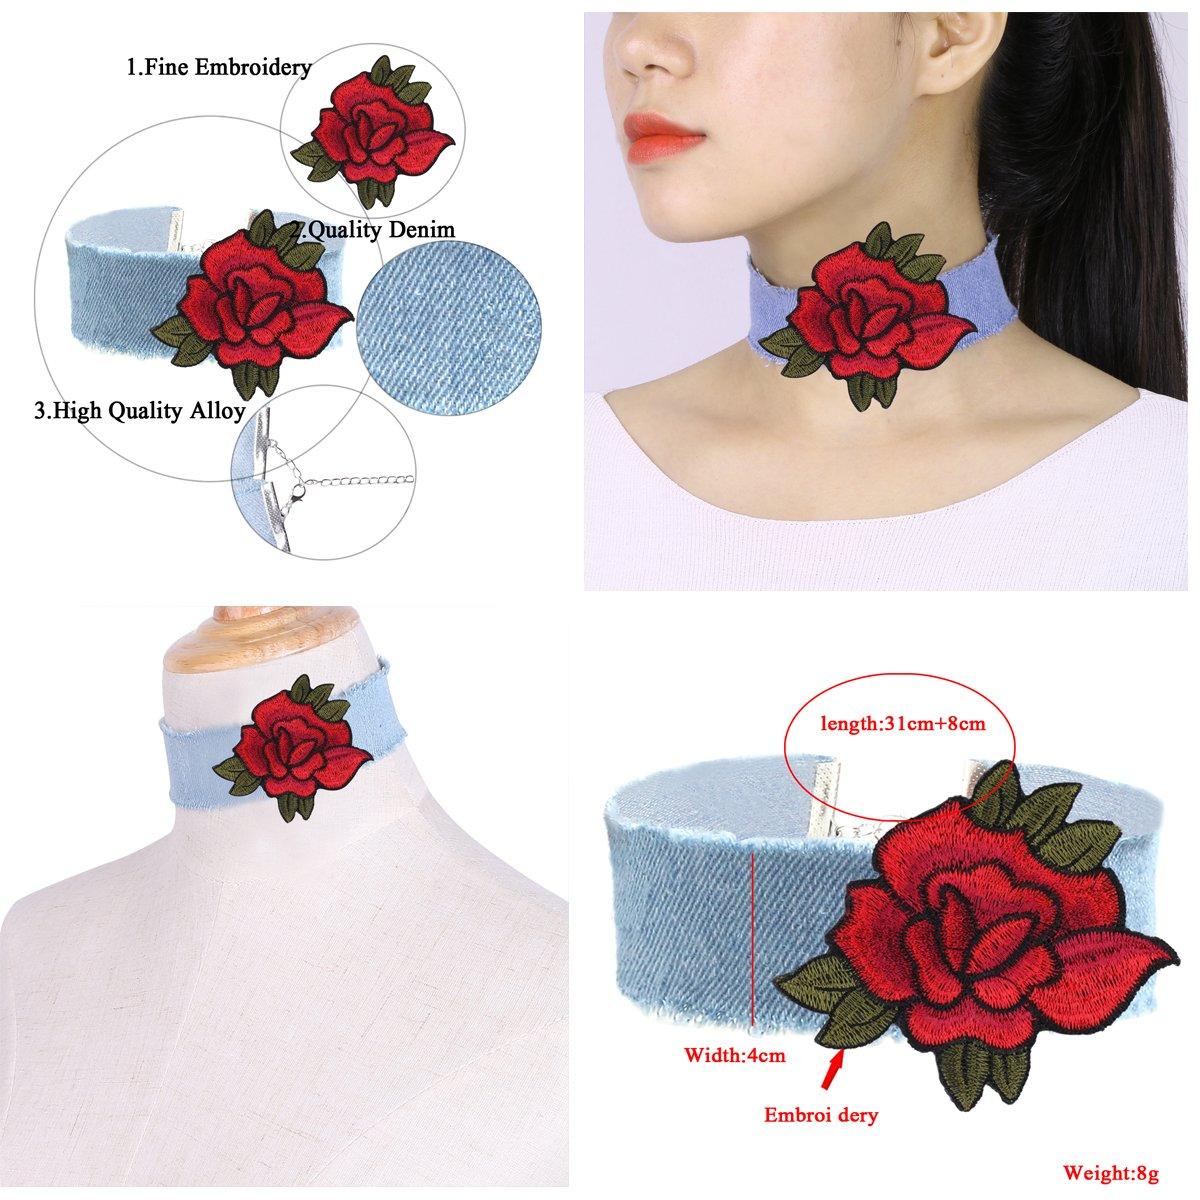 Tpocean 7PCS Embroidery Rose Punk Jeans Velvet Lace Tatoo Choker Set Women Girls Party Gifts